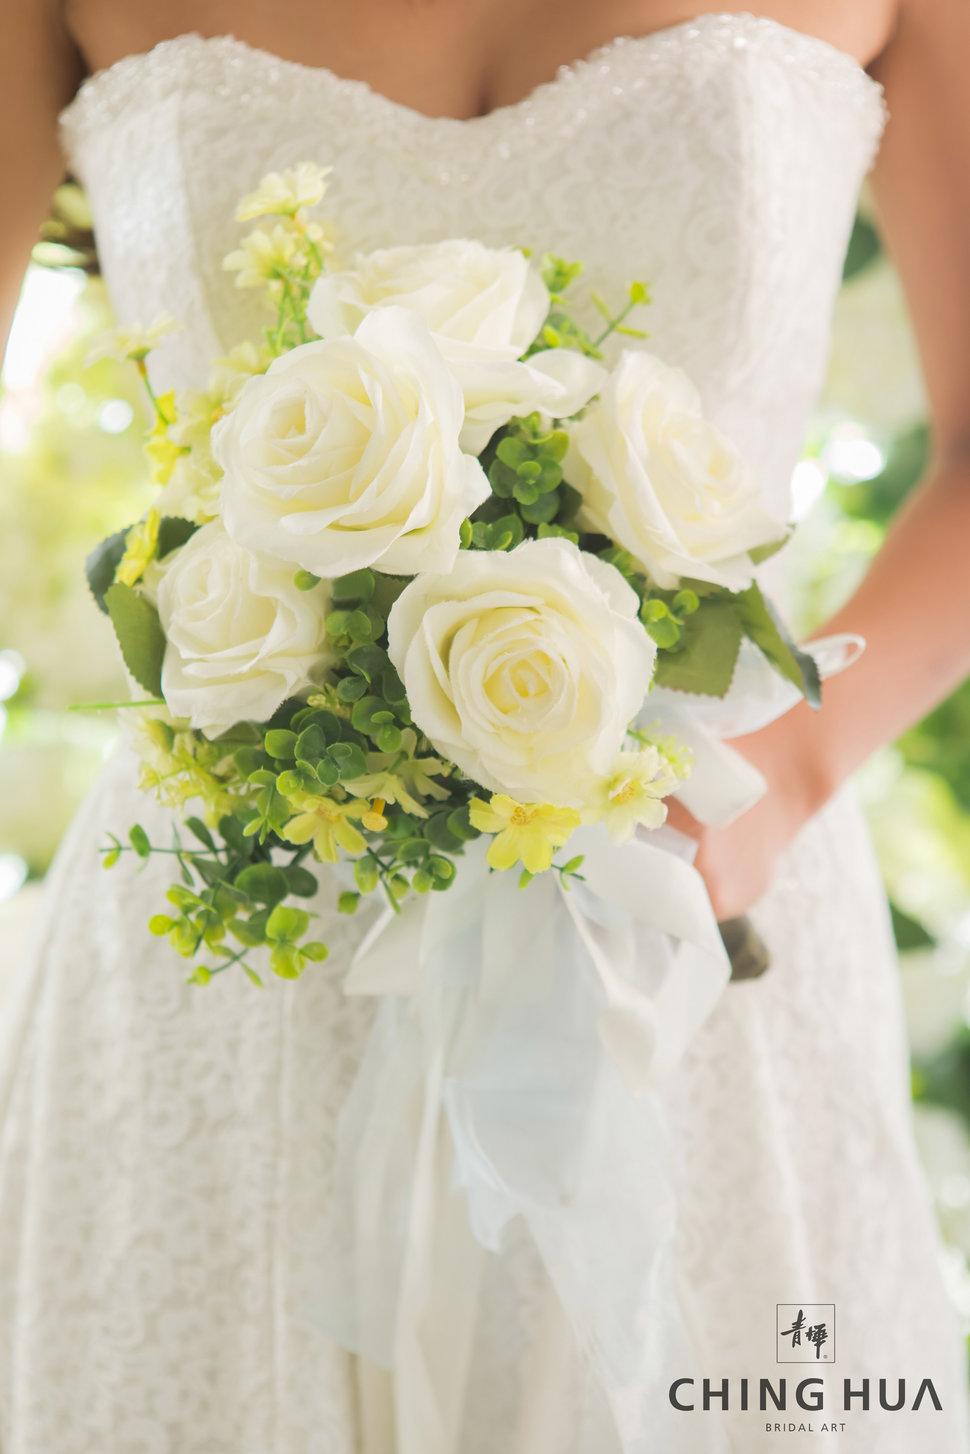 (編號:397223) - 青樺婚紗CHINGHUA - 結婚吧